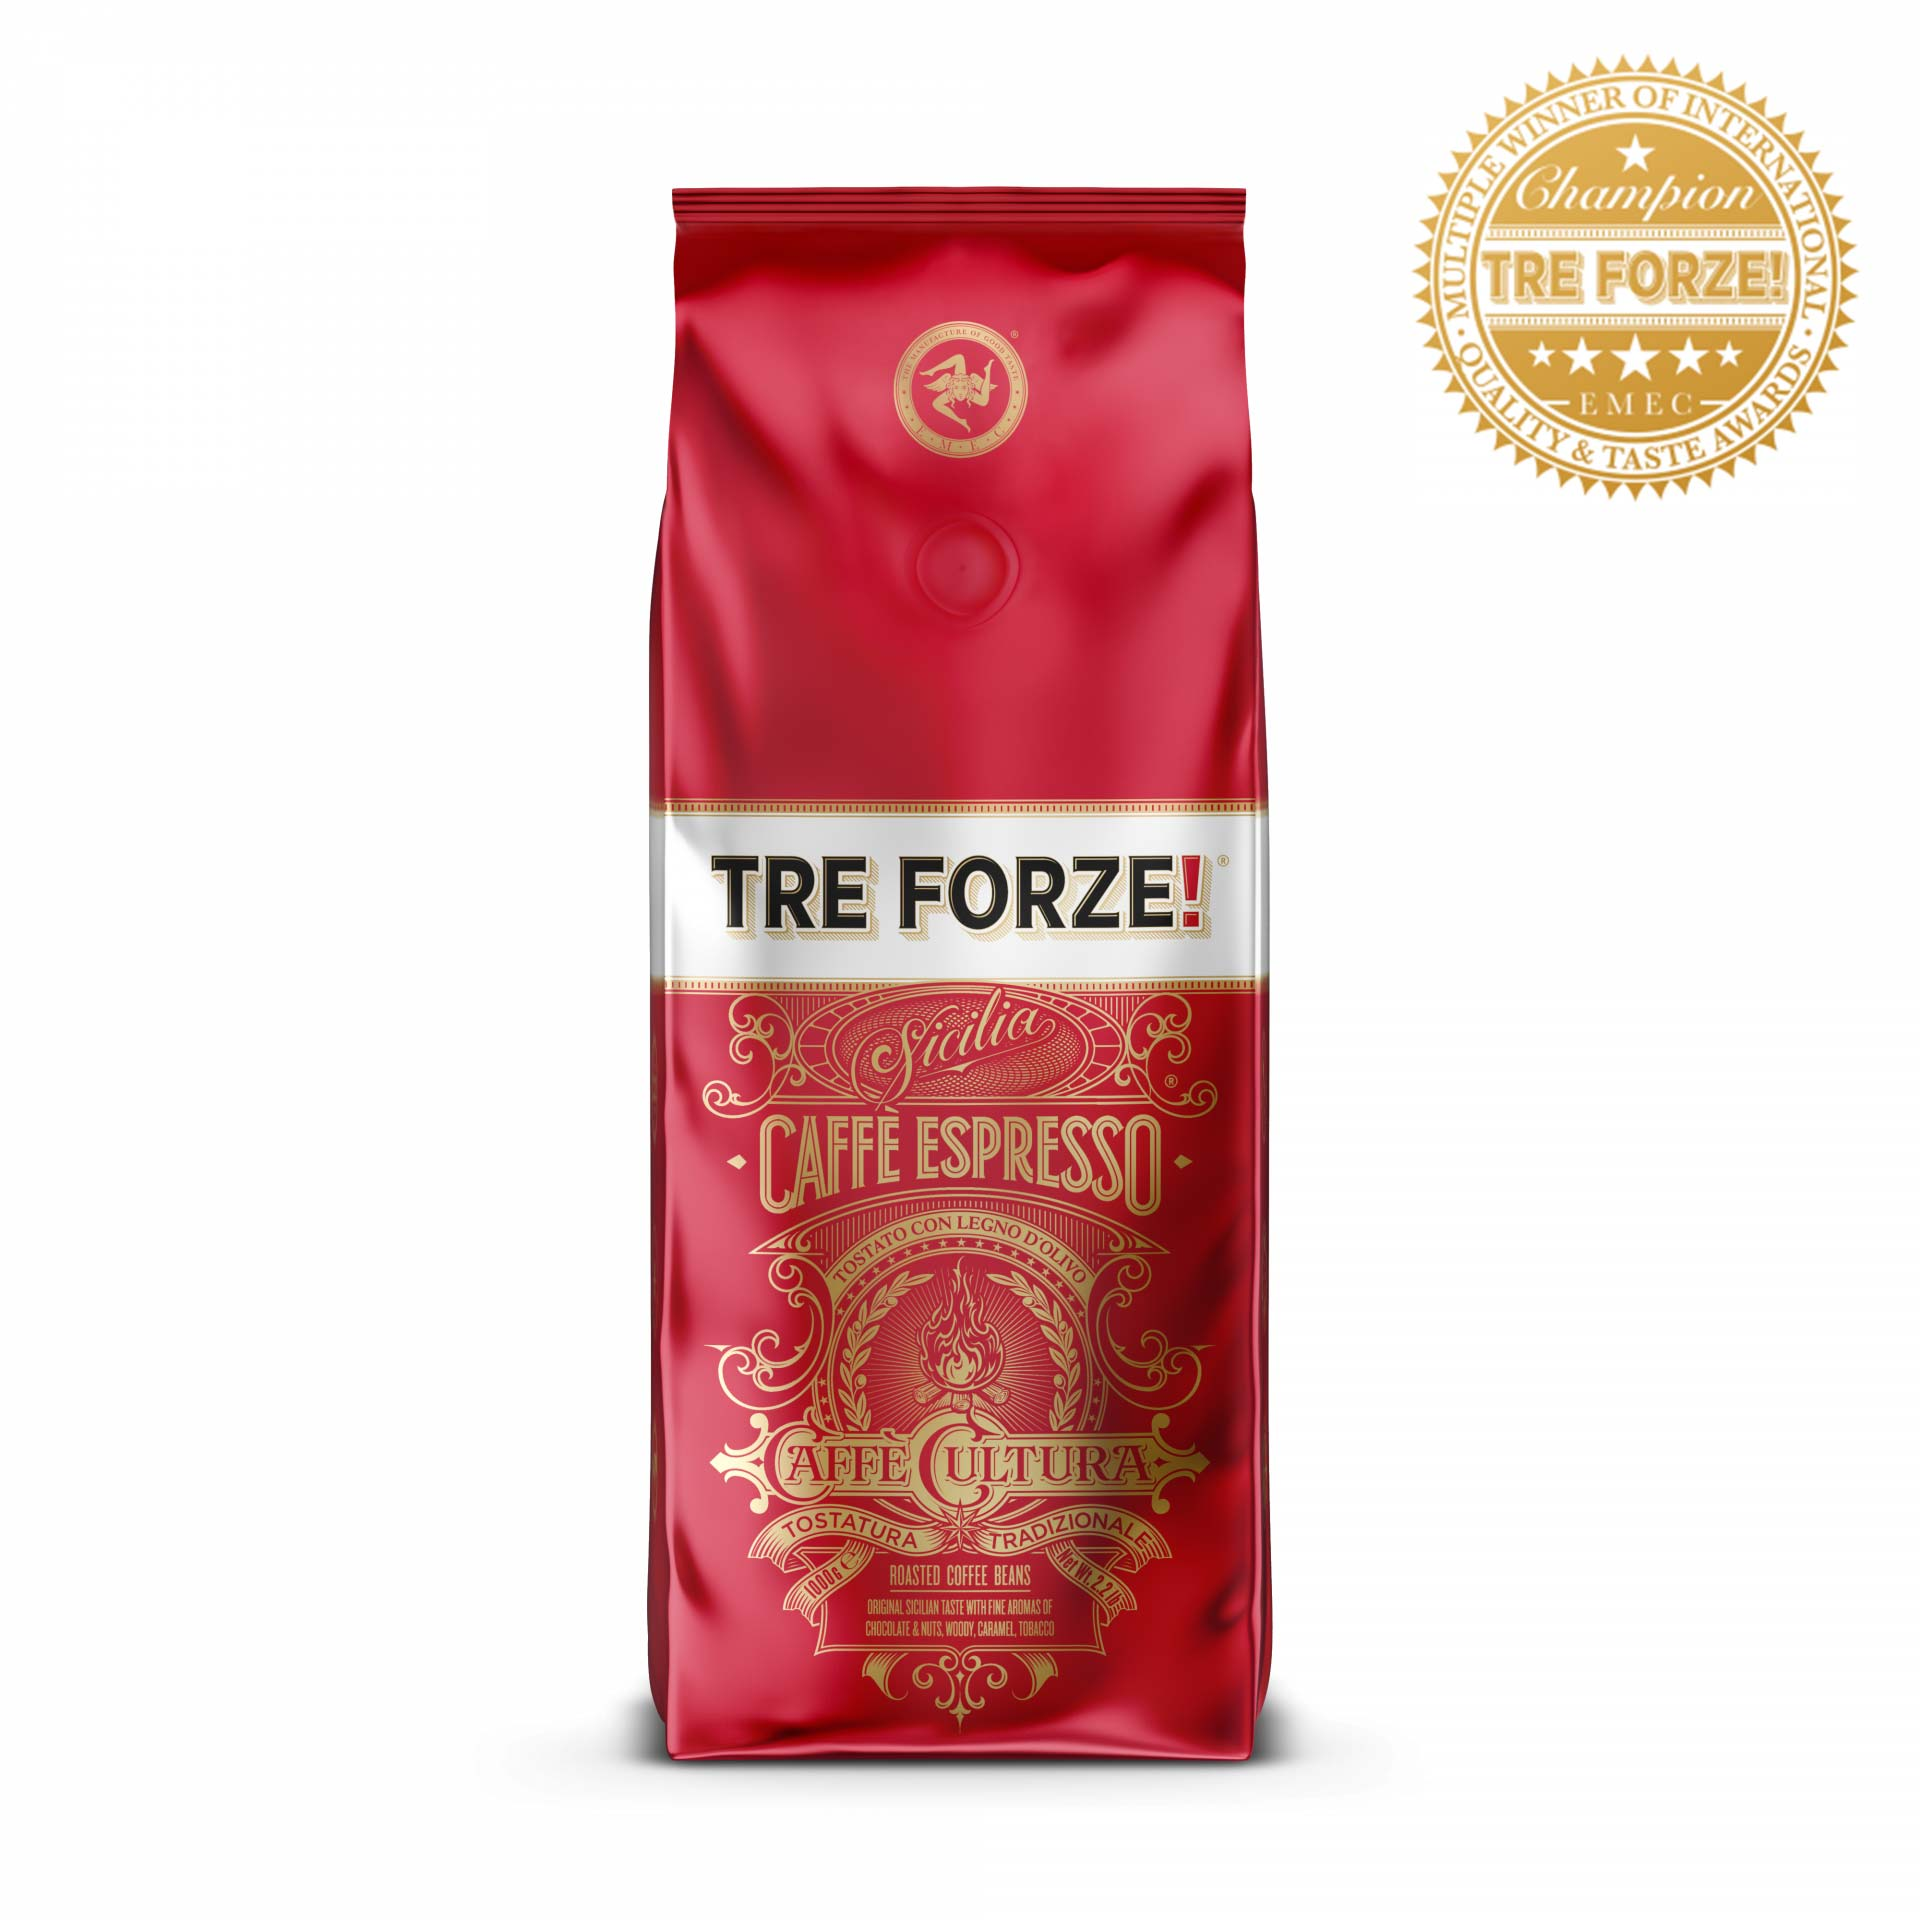 TRE FORZE! - Caffè Espresso - 1000g Bohnen